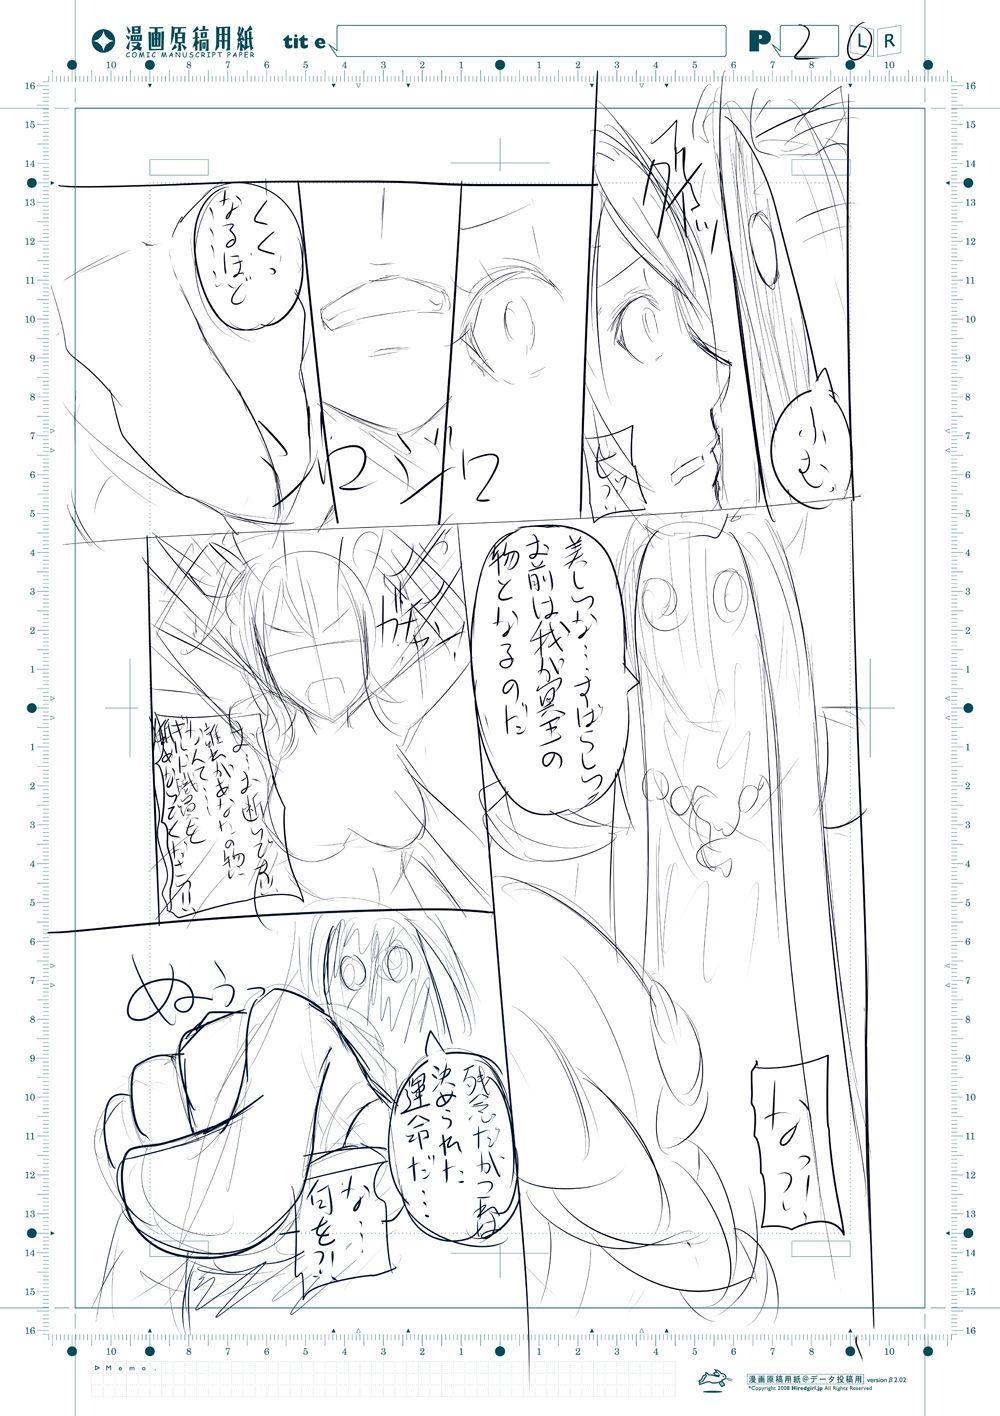 Goblin Slayer Sennou Manga 15